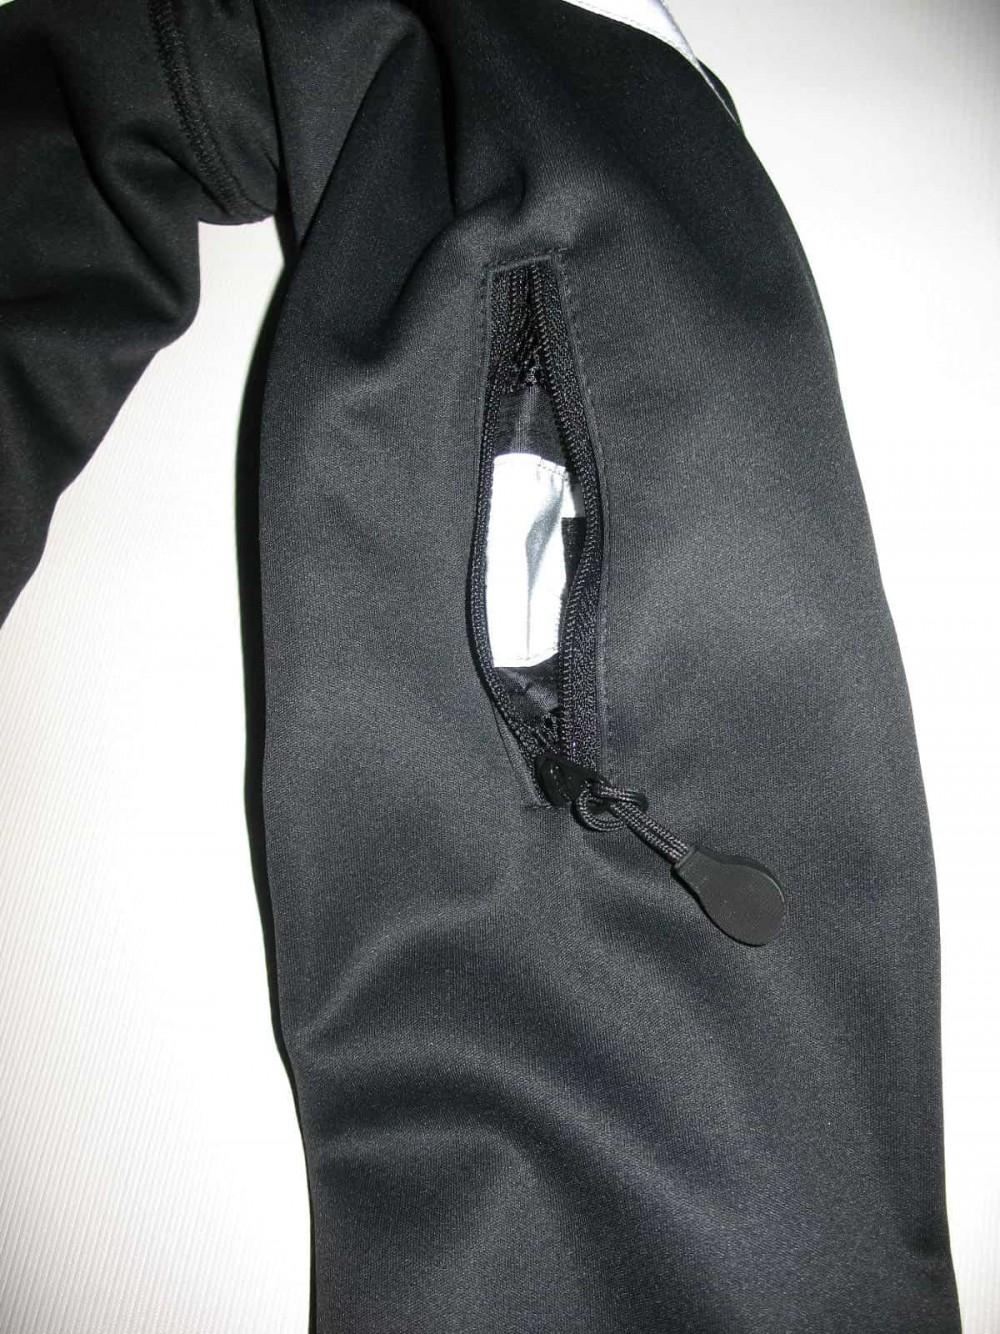 Велокуртка BTWIN aero sl cycling jacket (размер М) - 7